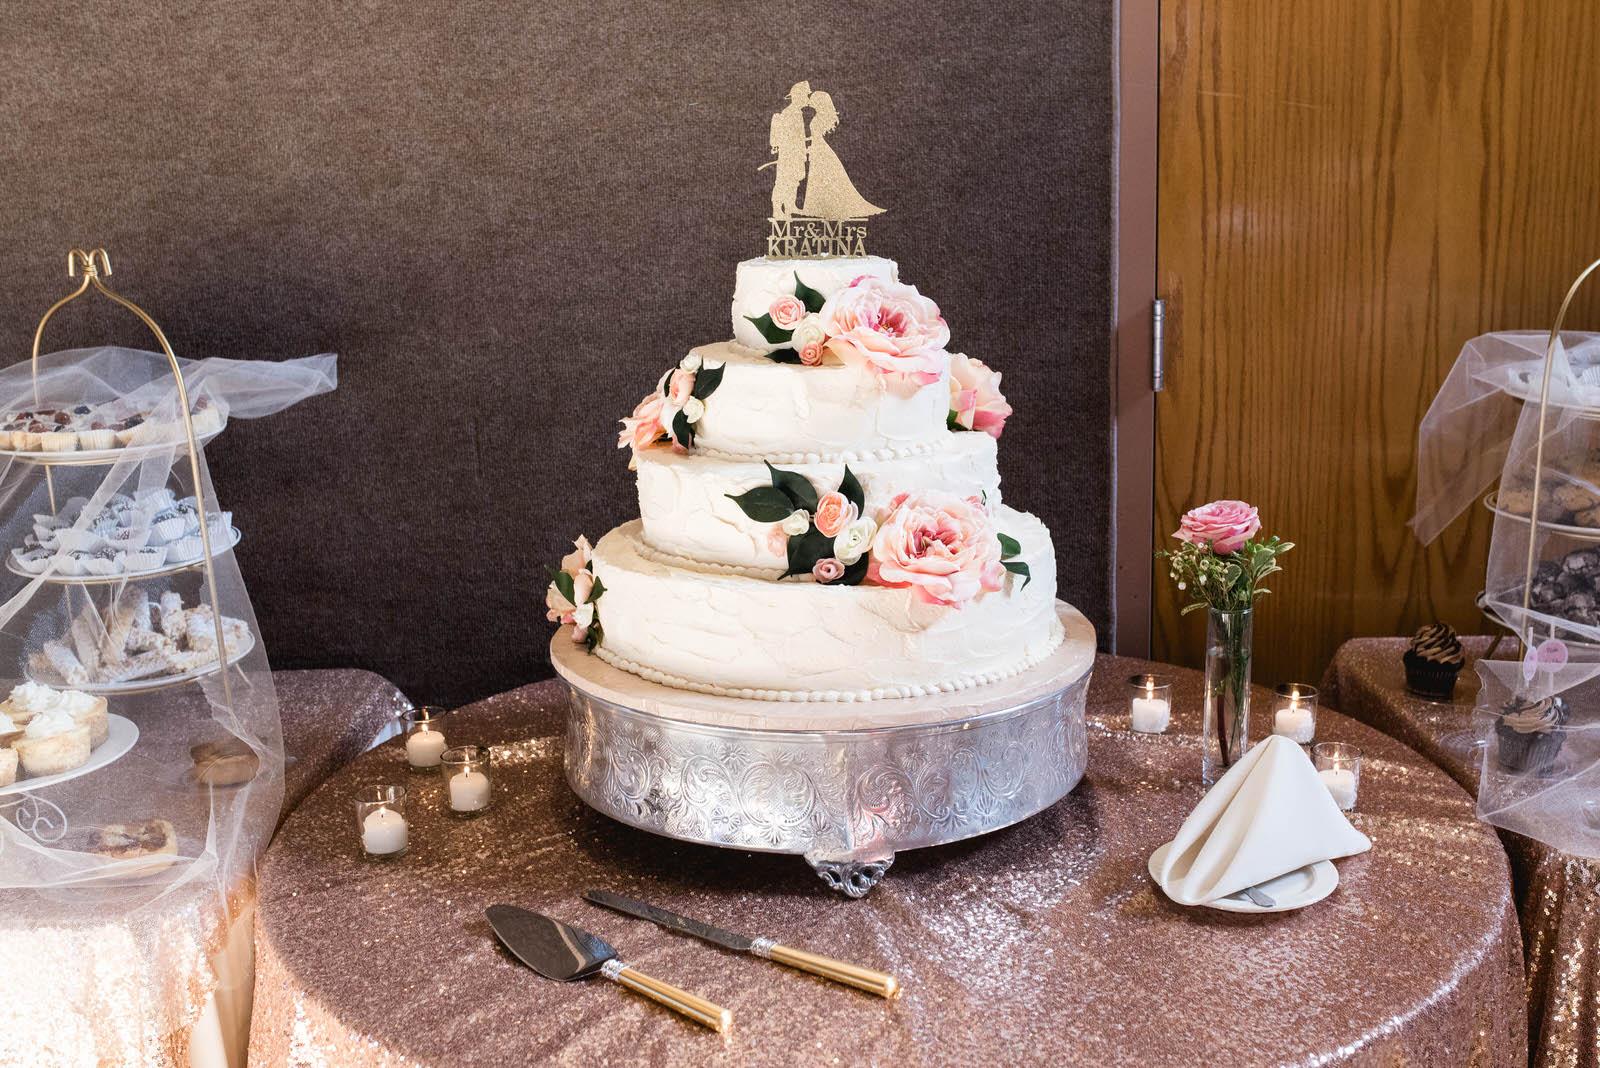 weddings-at-Holy-Cross-Greek-Orthodox-Church-and-Hall-55.jpg